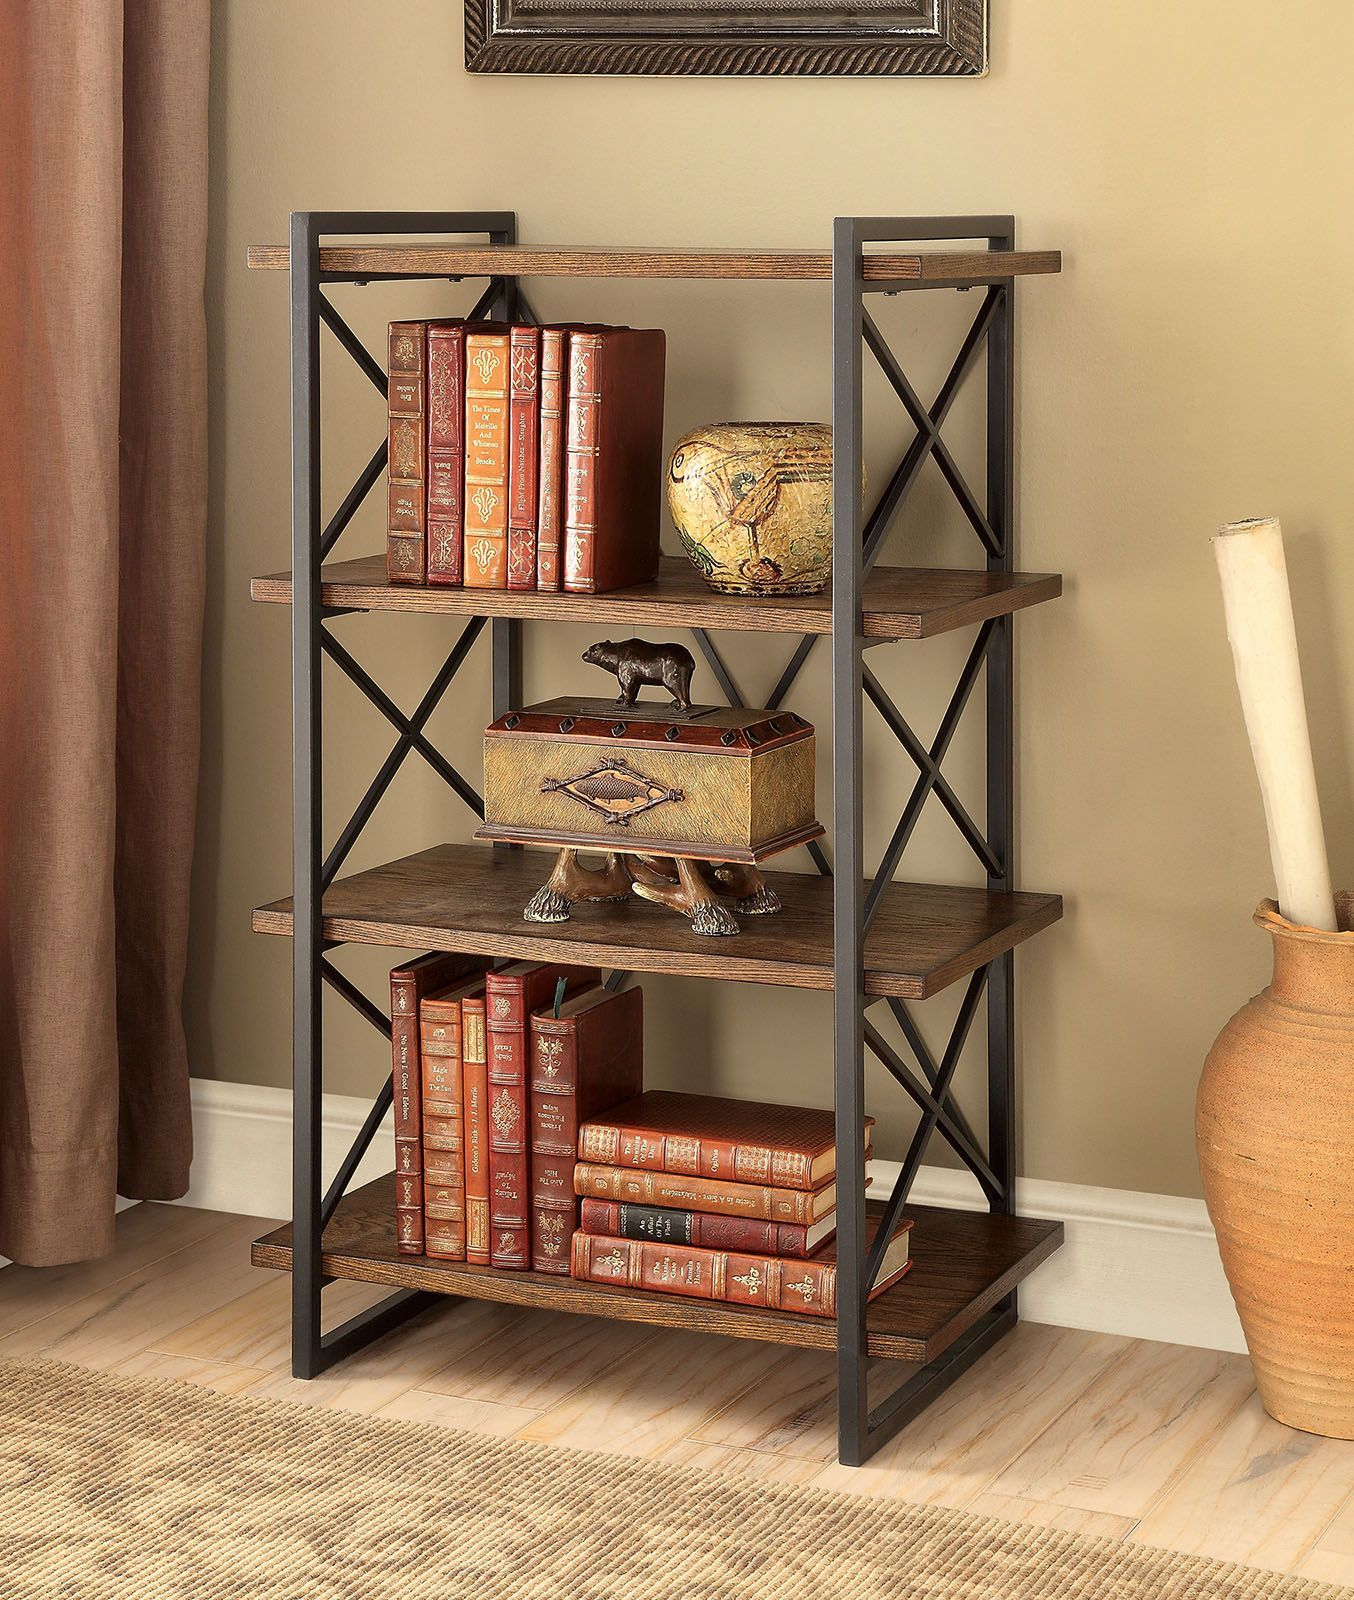 Verdana Iii Collection Cm Ac6203 Bookcase Industrial Design